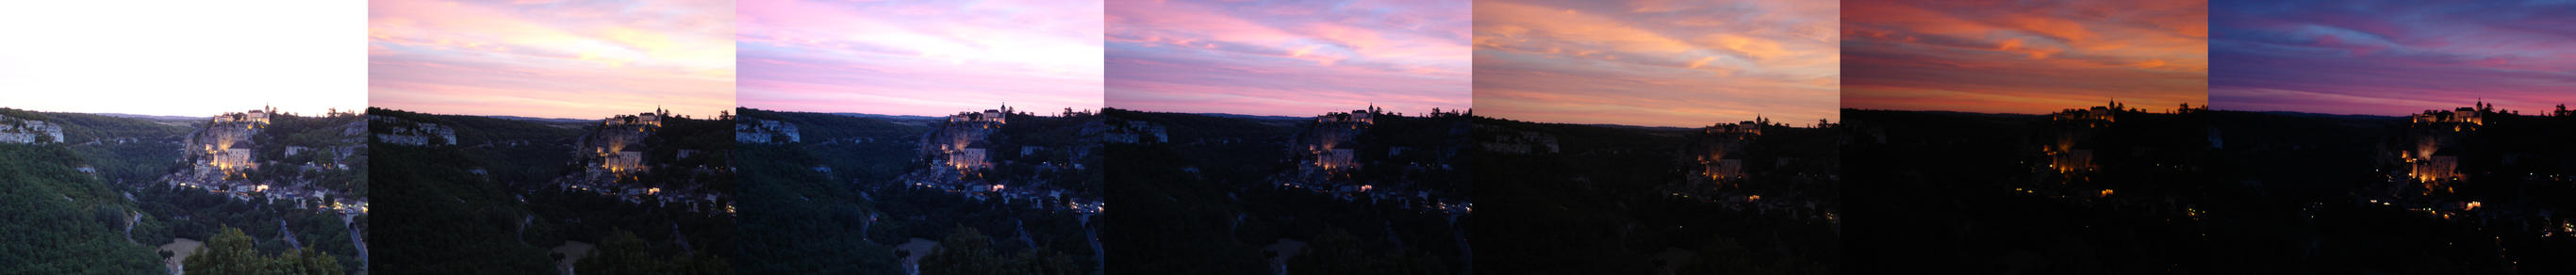 Rocamadour sunset by seretur1